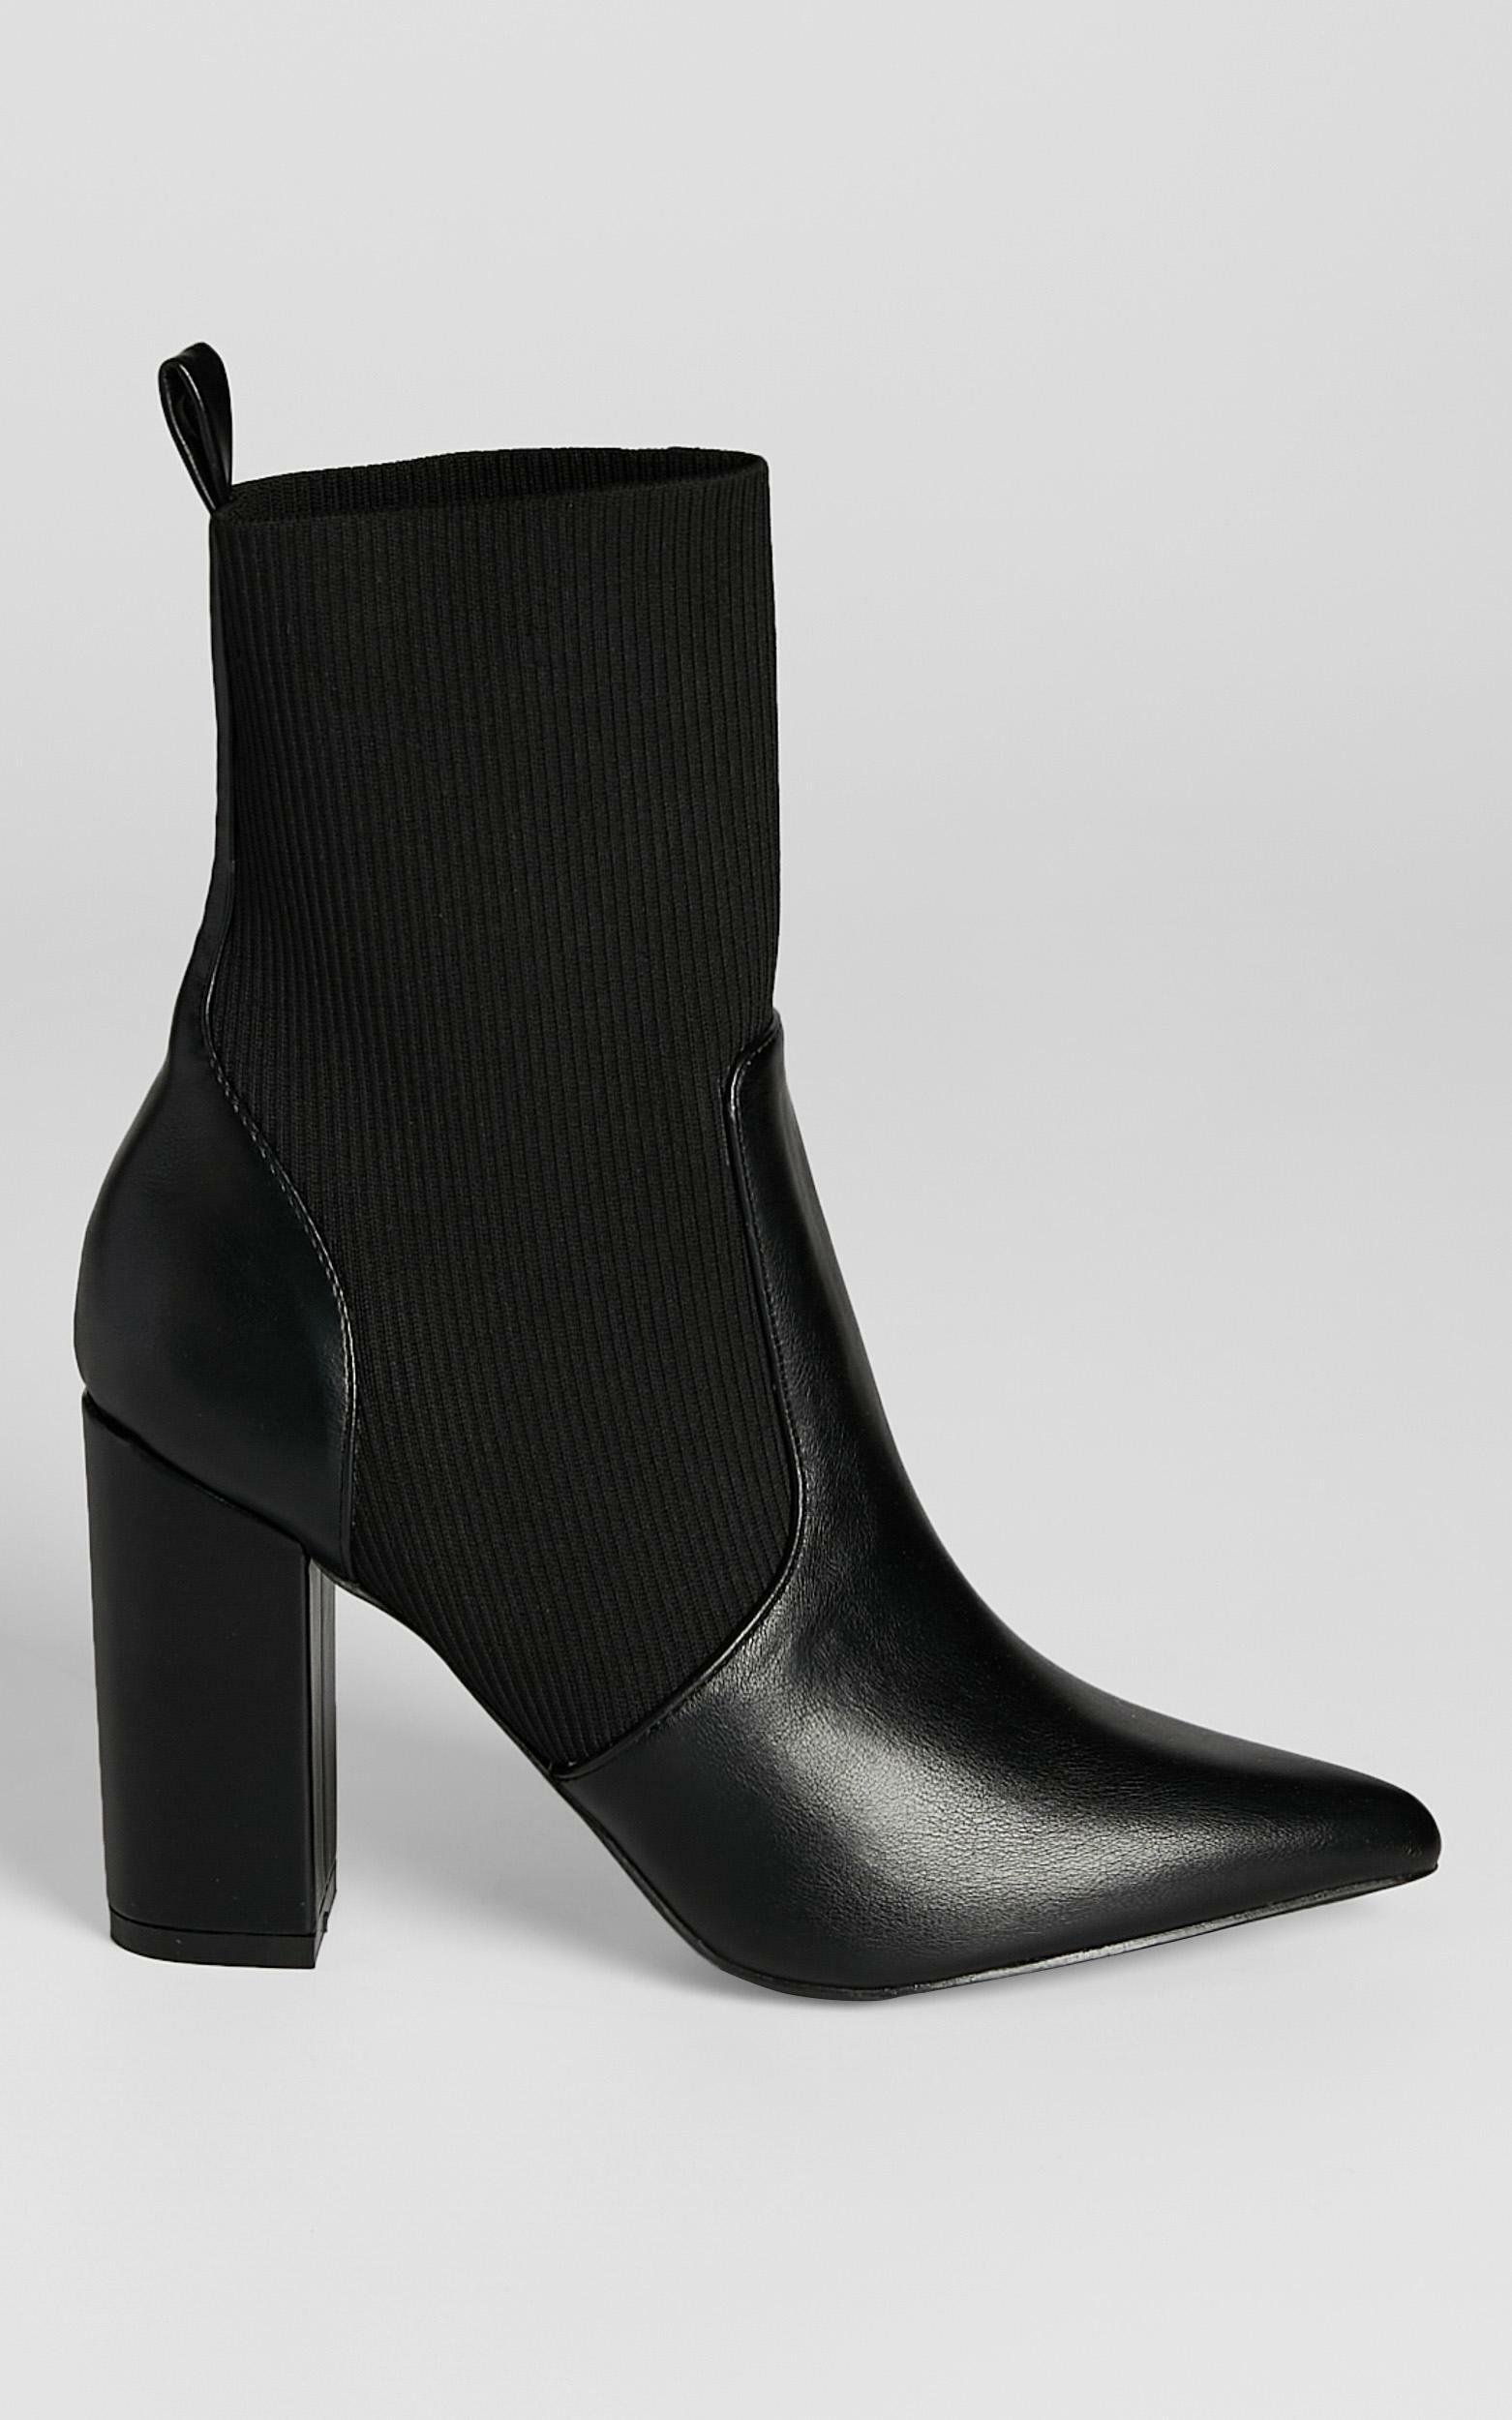 Verali - Dixie Boots in Black - 5, Black, hi-res image number null